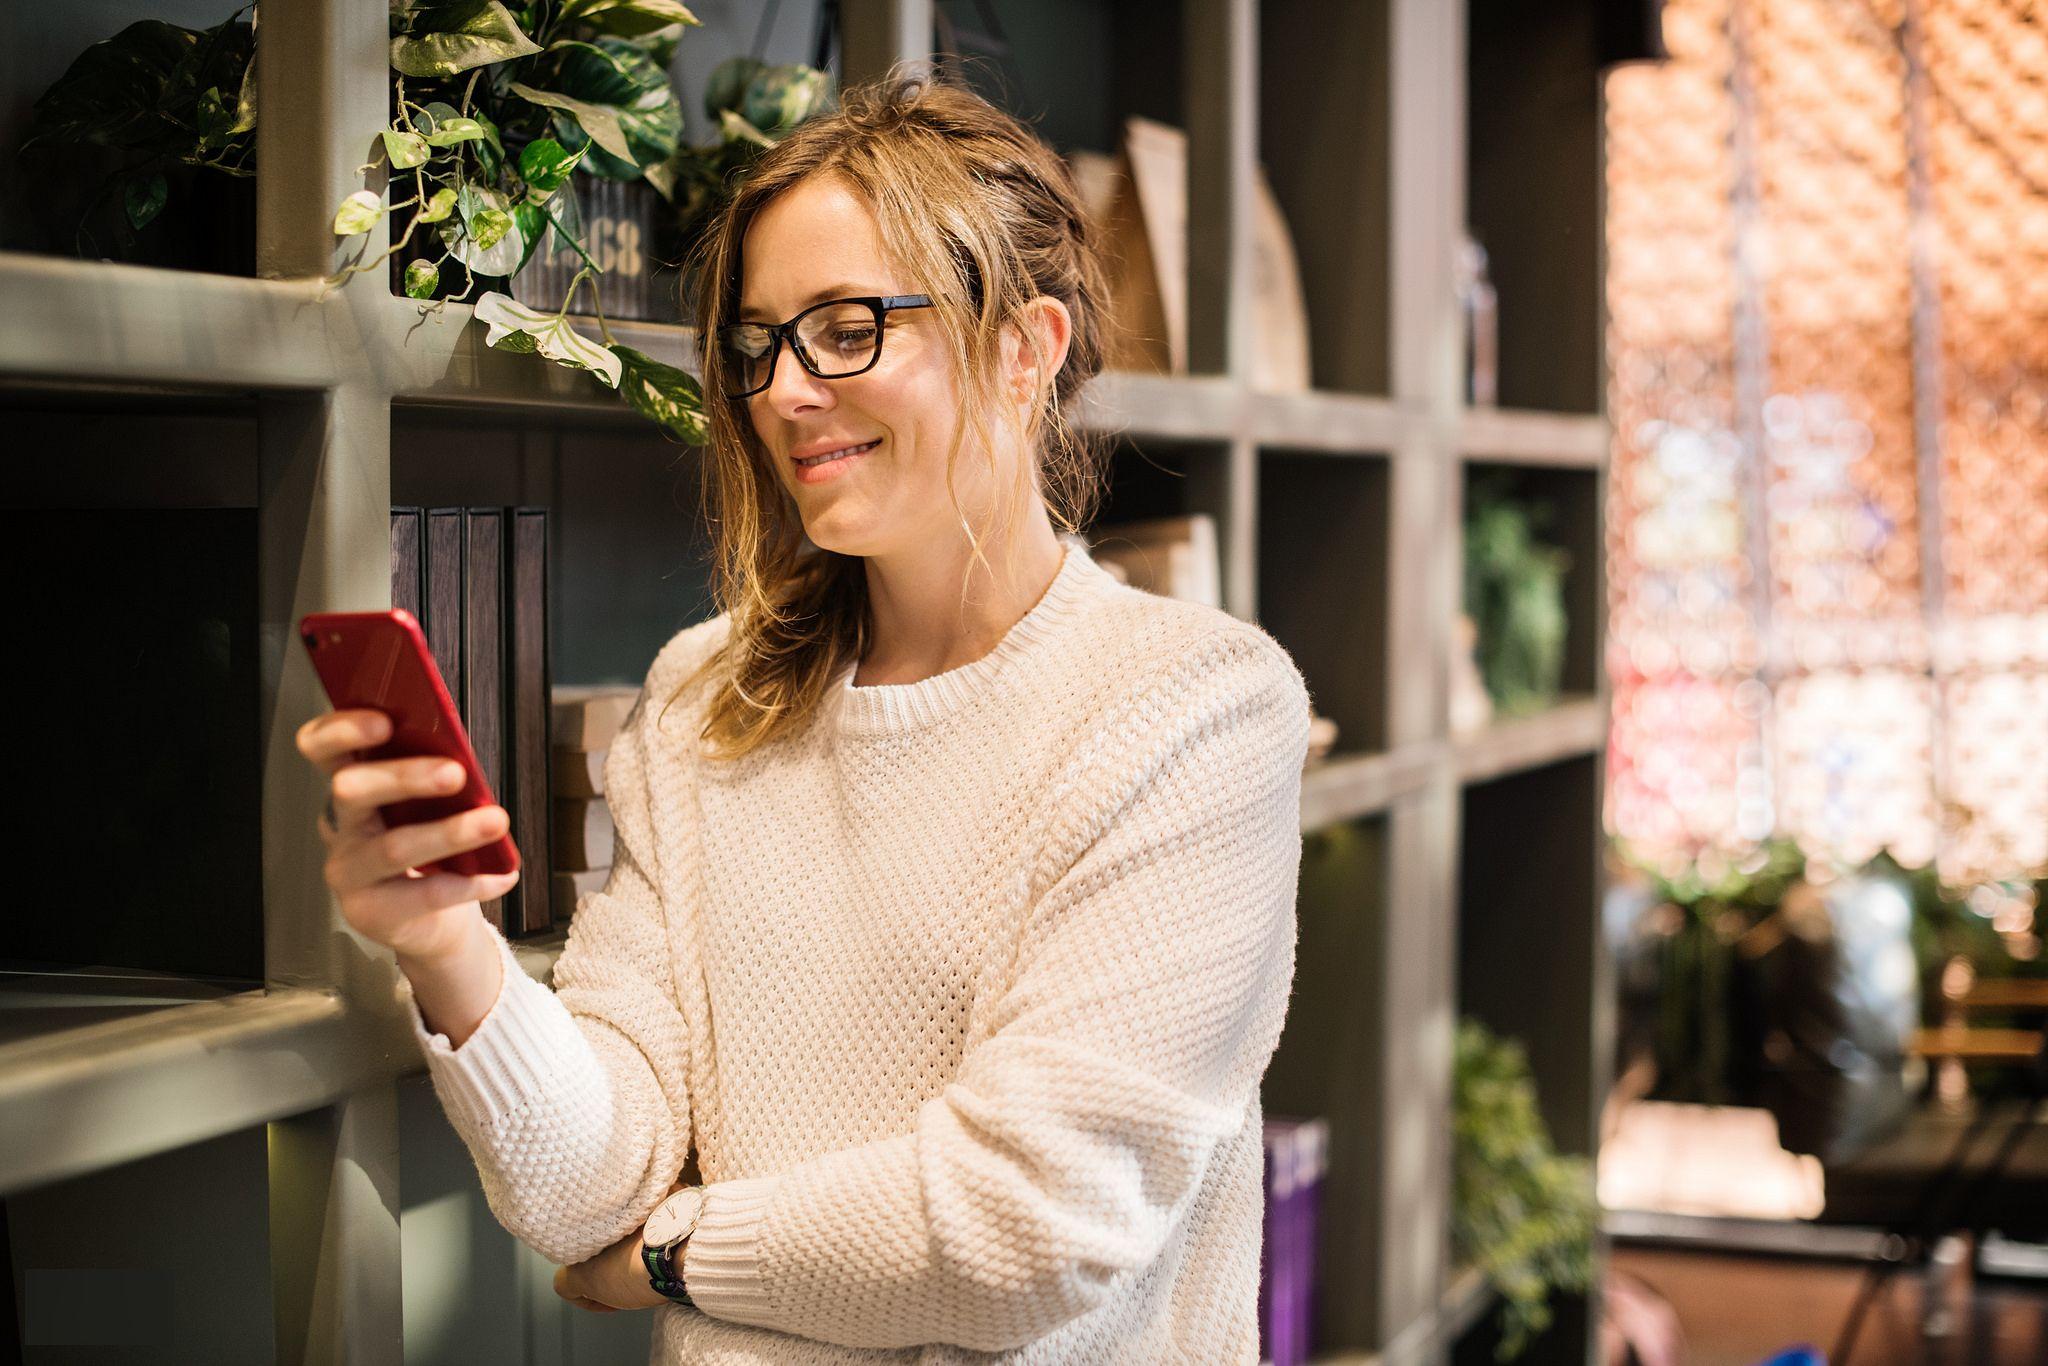 online dating AnastasiaDate